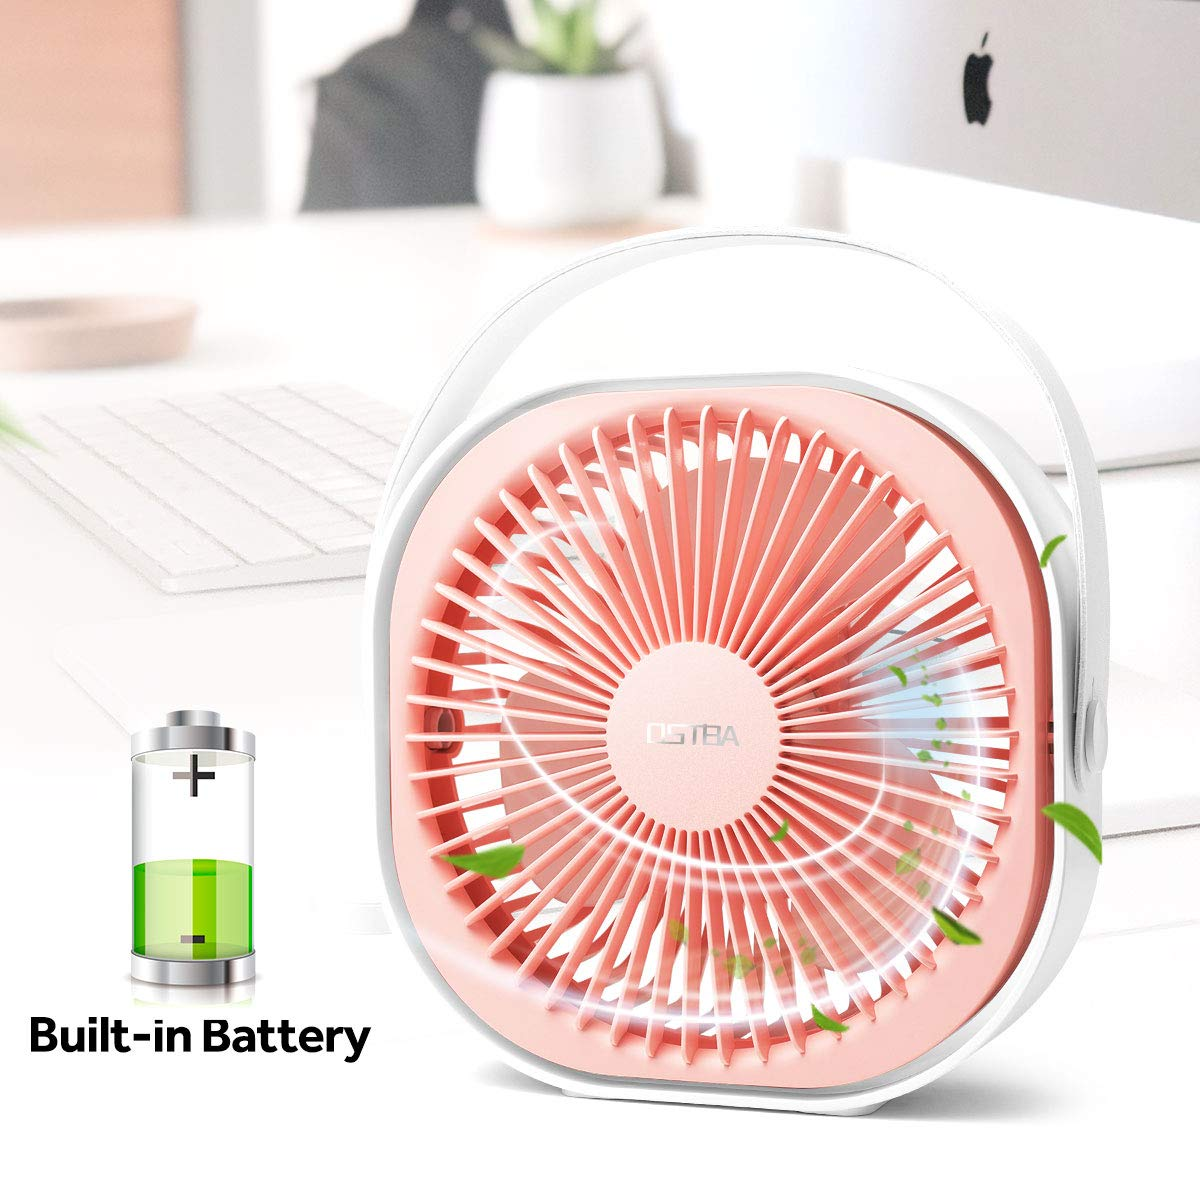 Ventiladores Abanicos Para Camiones Carros Portatil Recargable Bateria Carga USB